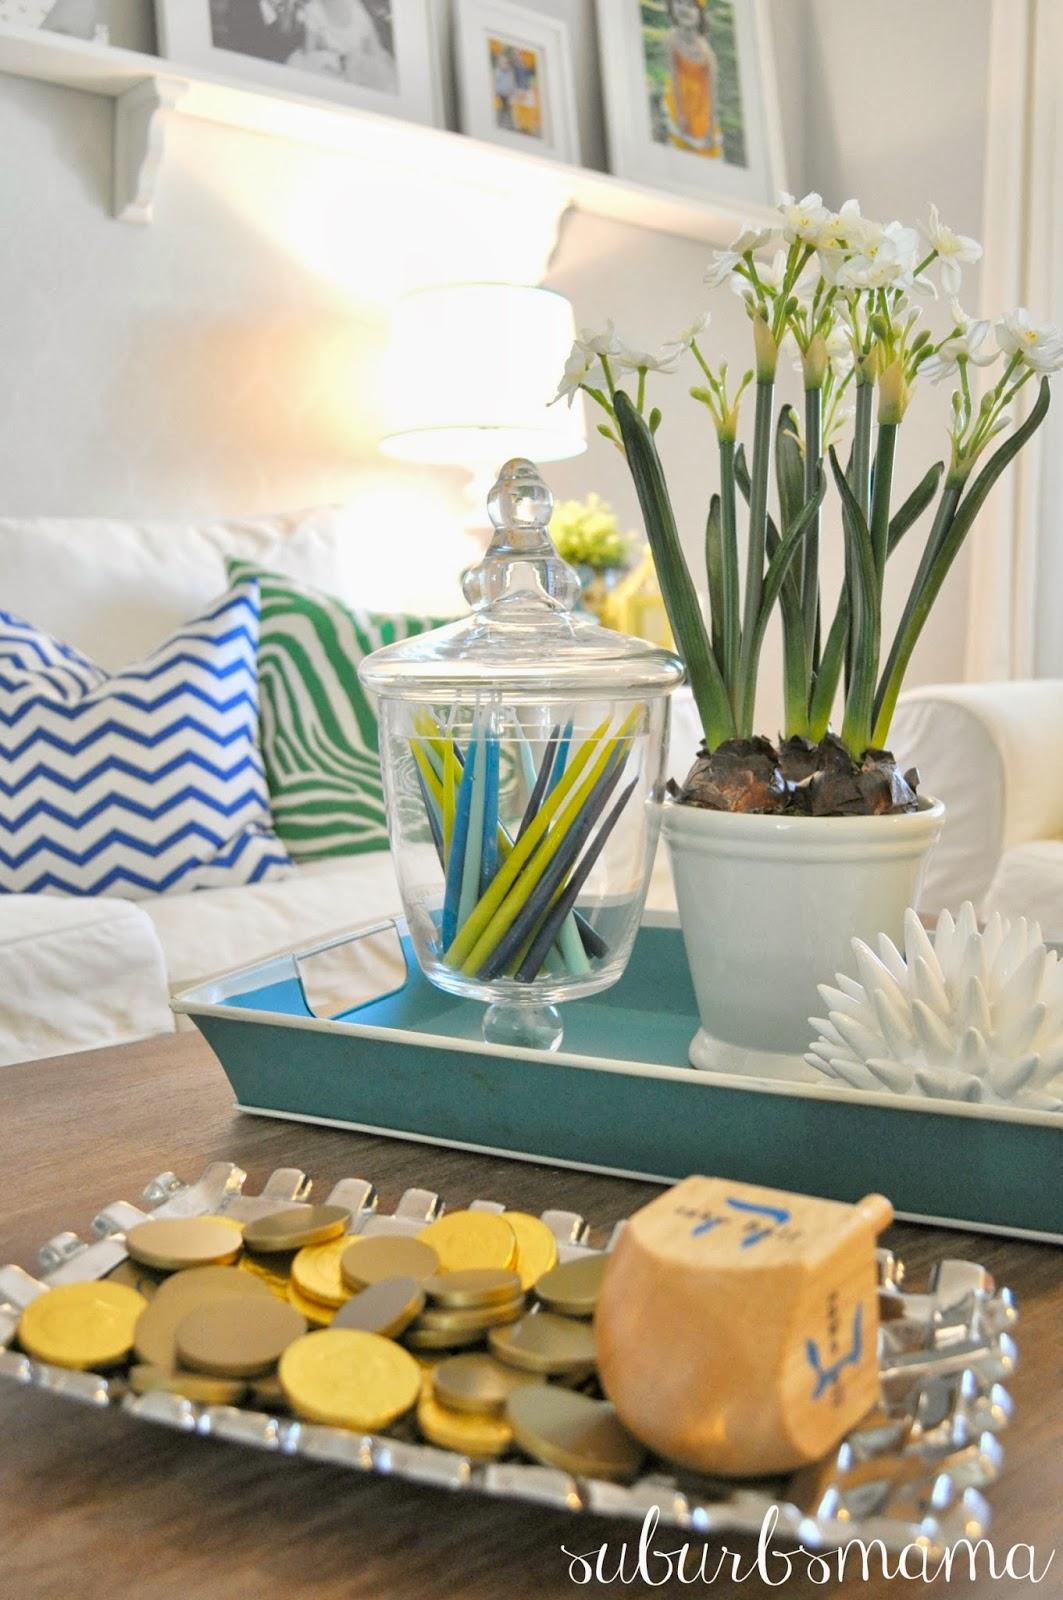 Decorative Items For Living Room: Suburbs Mama: Hanukkah Decor 2013